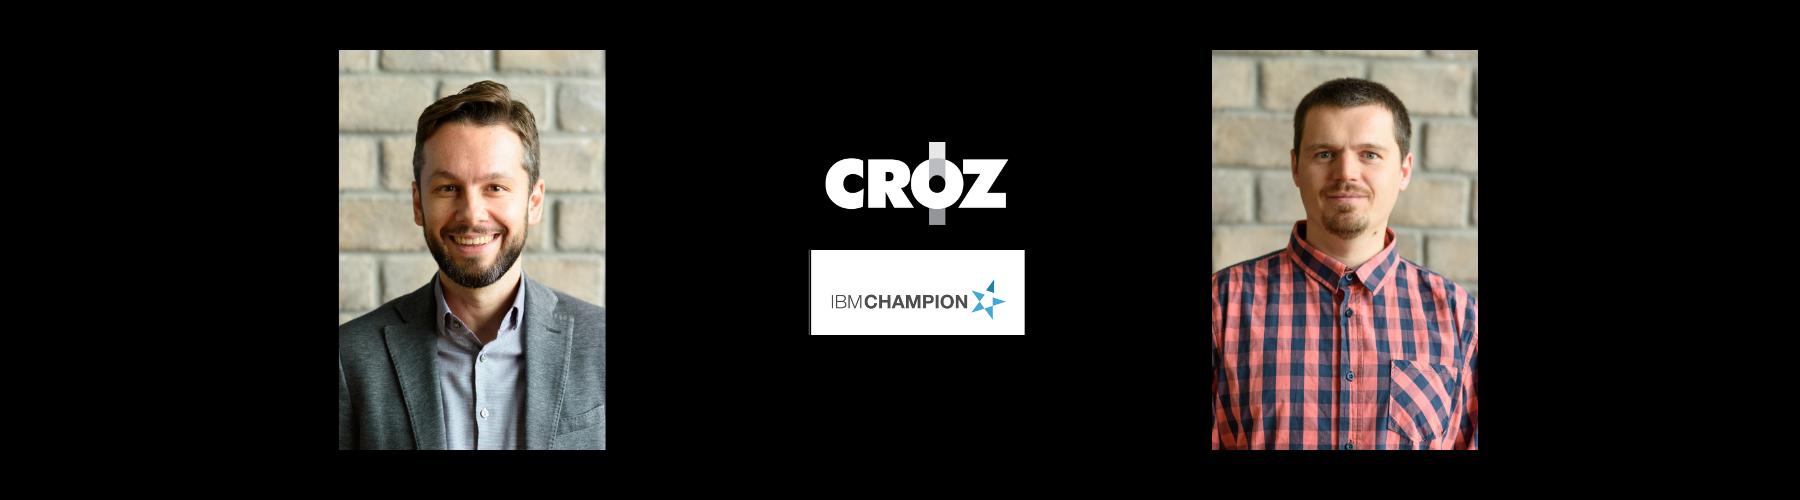 IBM Champions by CROZ